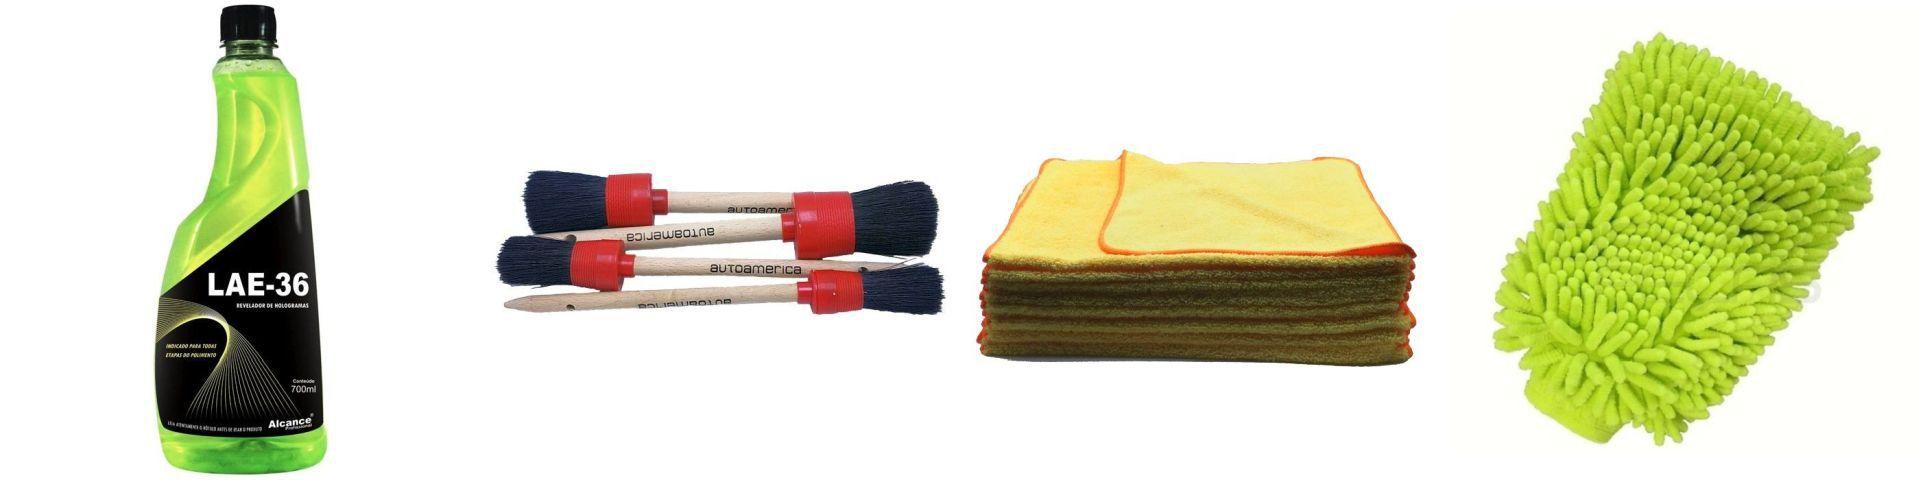 Kit Lae-36+Pinceis+Flanelas+Luva Microfibra